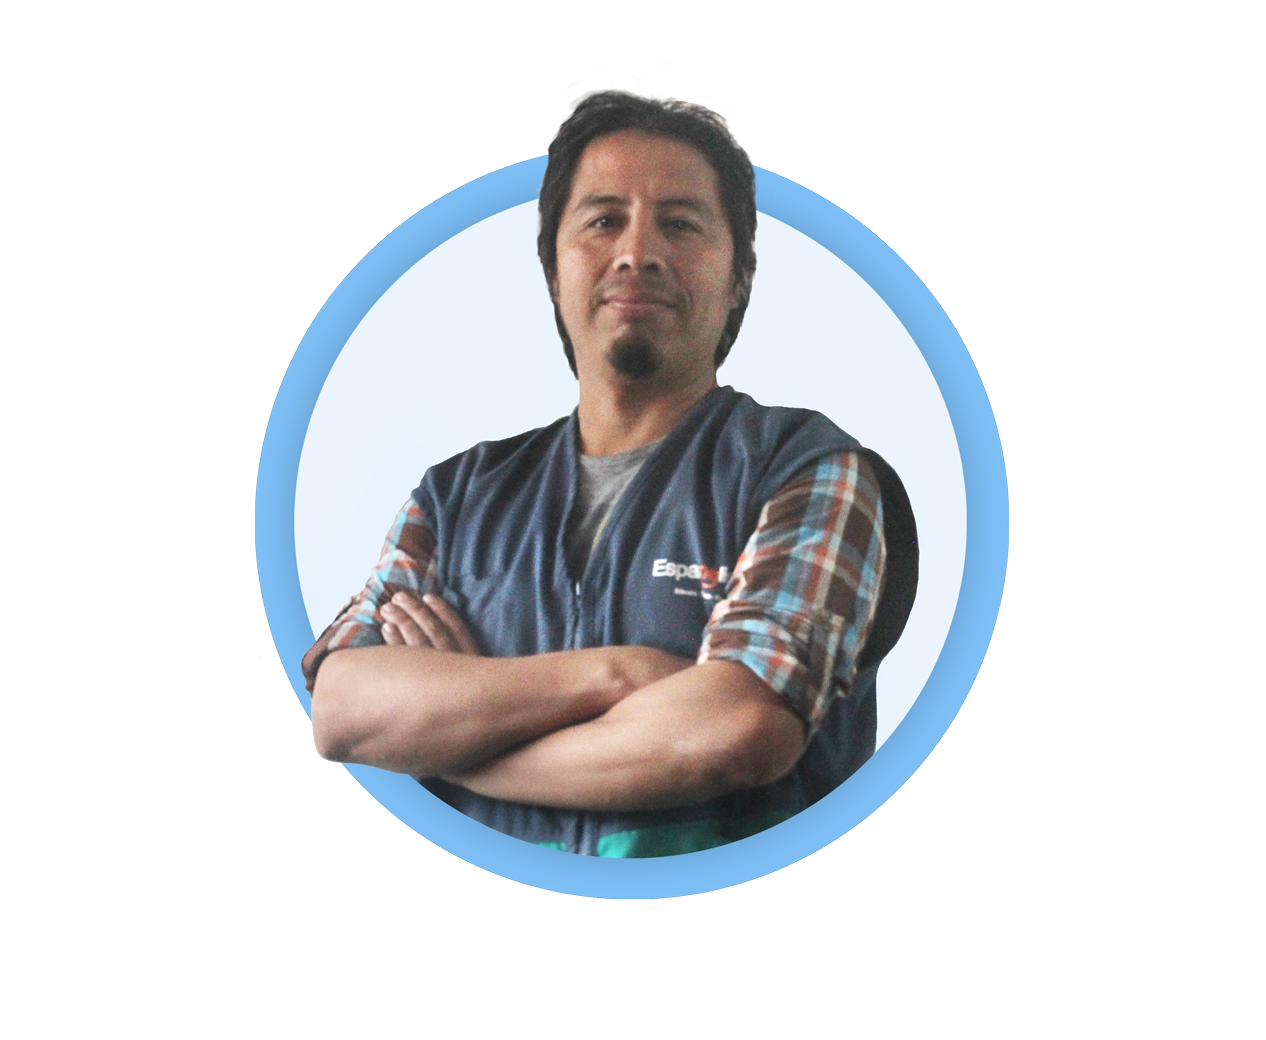 David H. Mercedes. - Founder